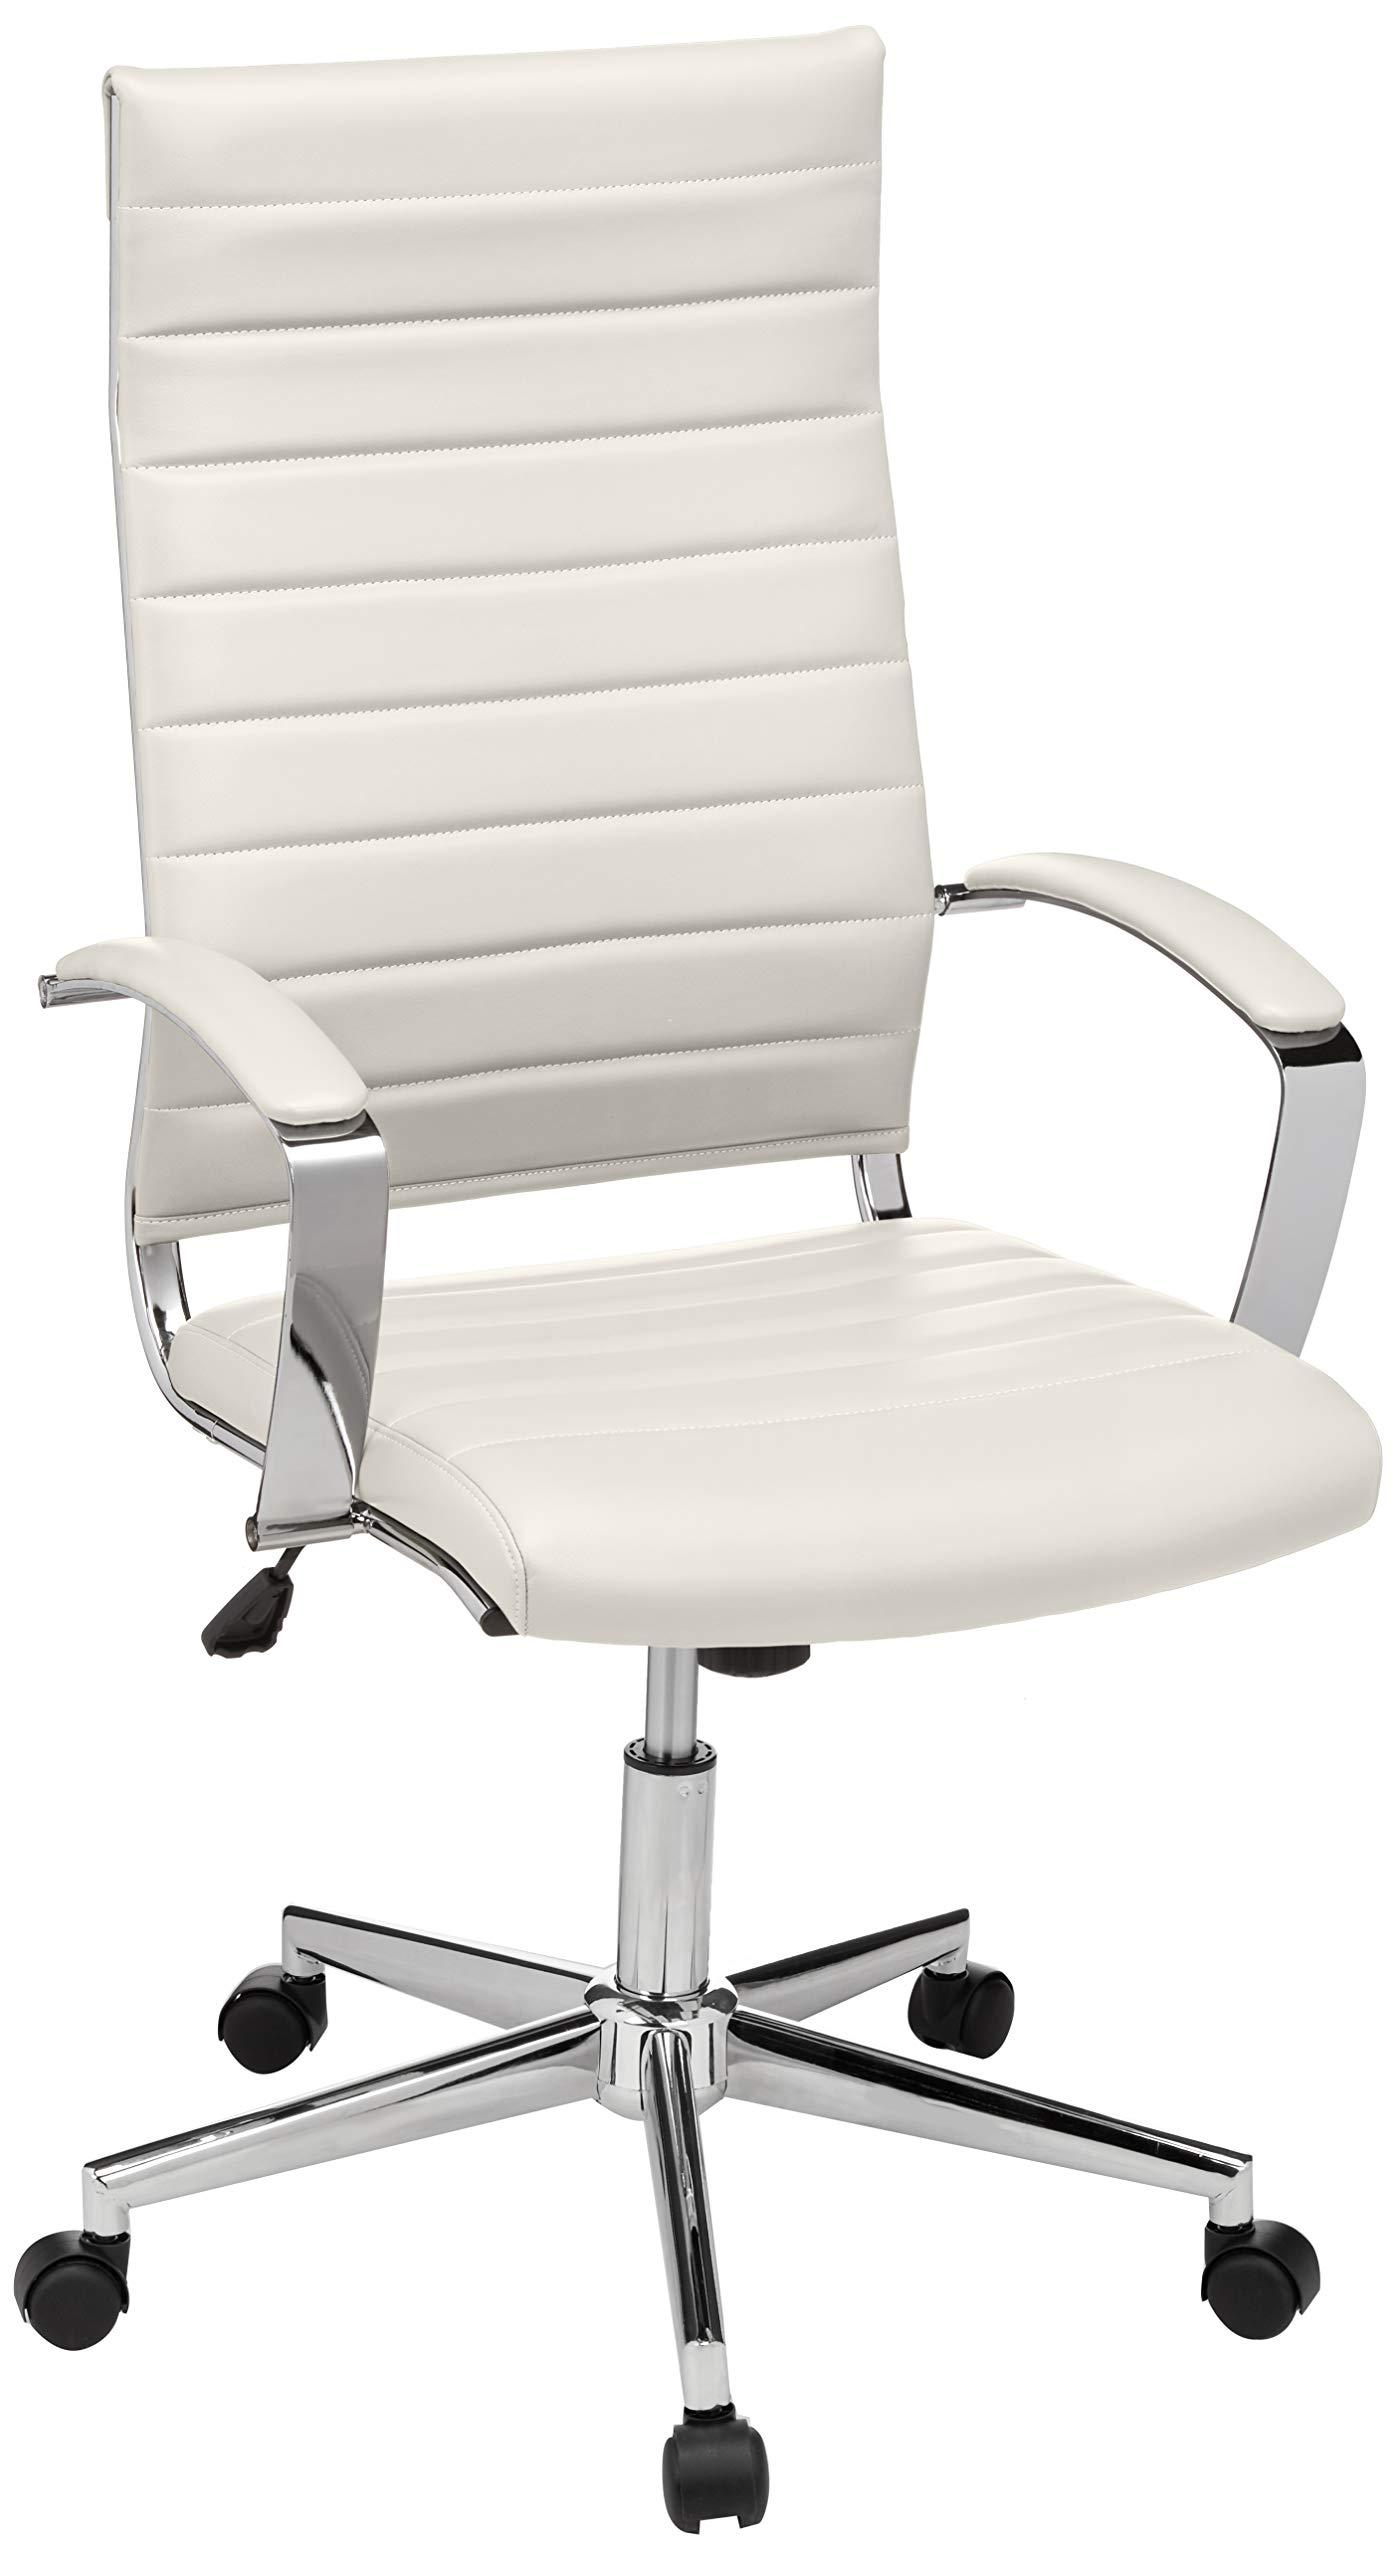 AmazonBasics High-Back Executive Swivel Office Desk Chair with Ribbed Puresoft Upholstery - White by AmazonBasics